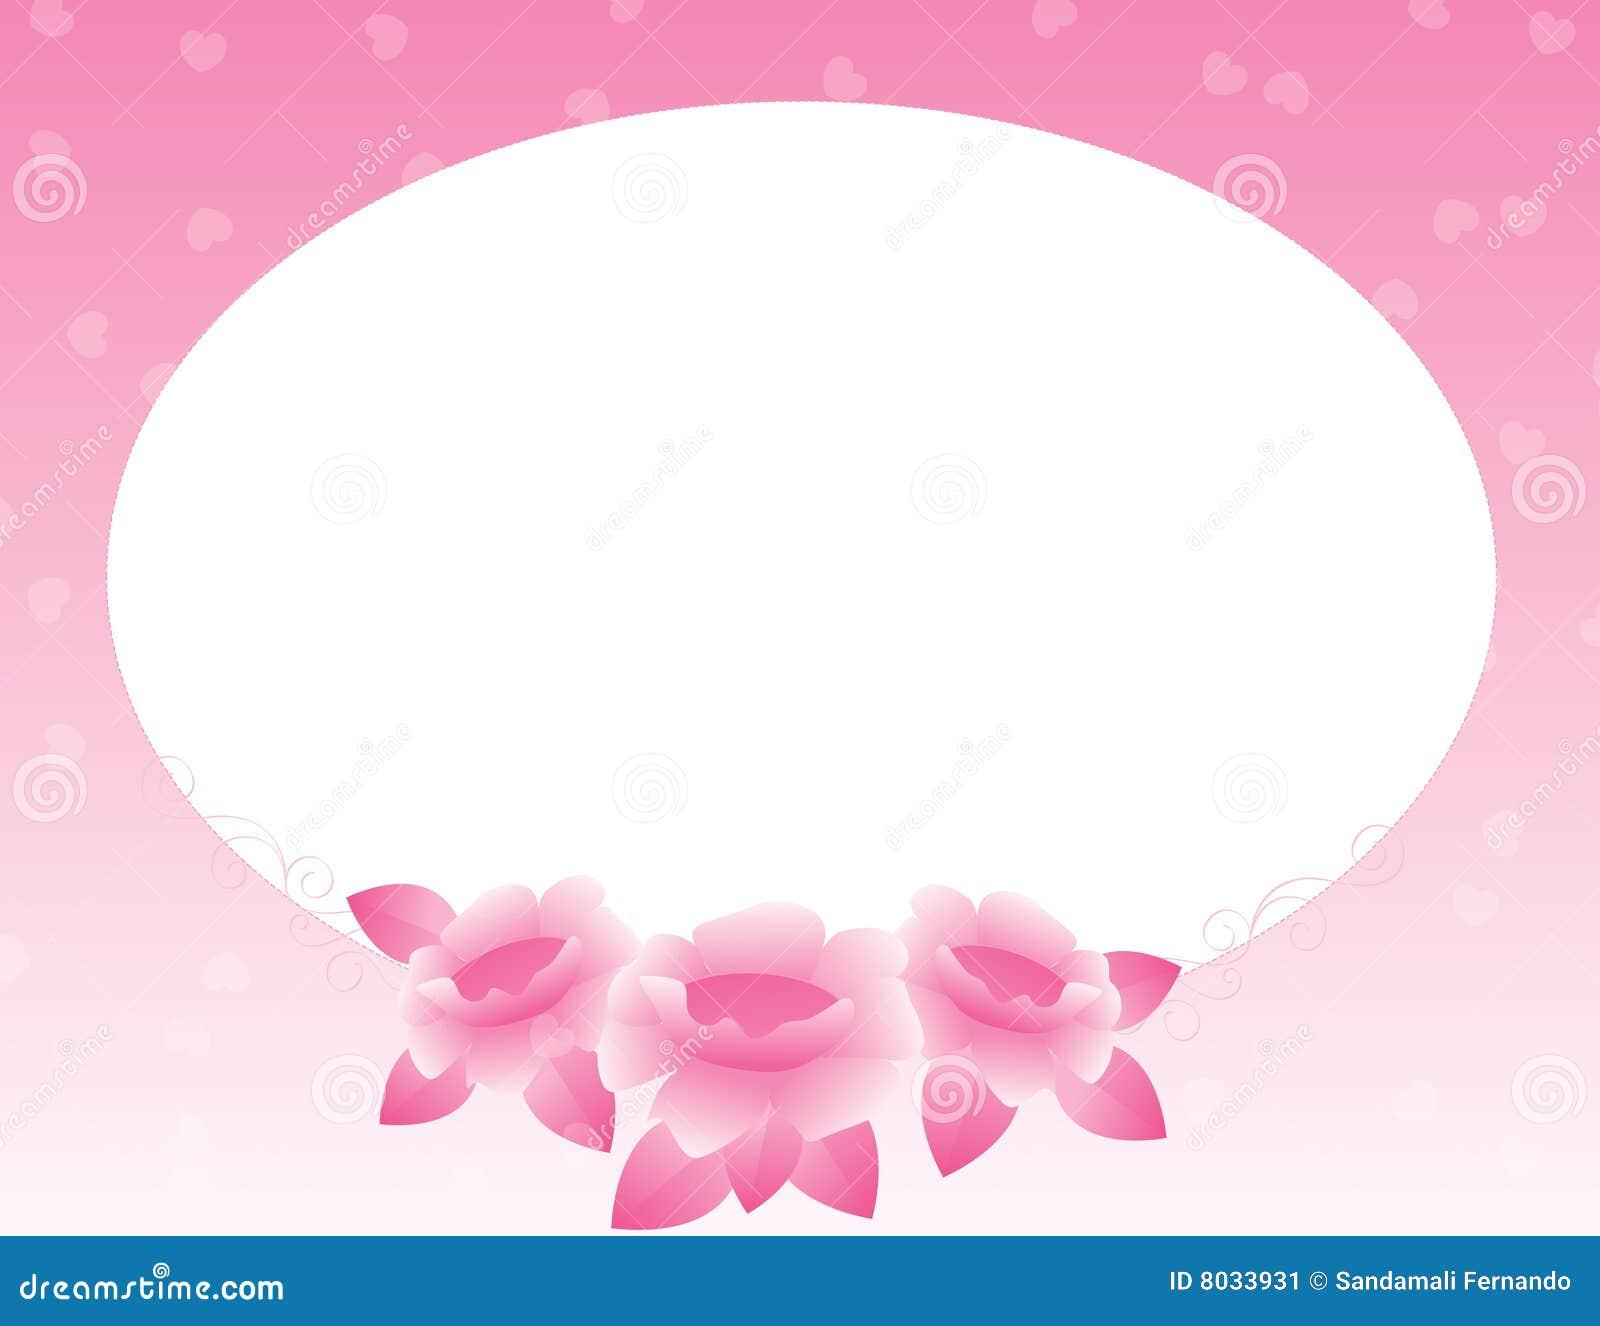 Petal Wedding Invitations with beautiful invitation design